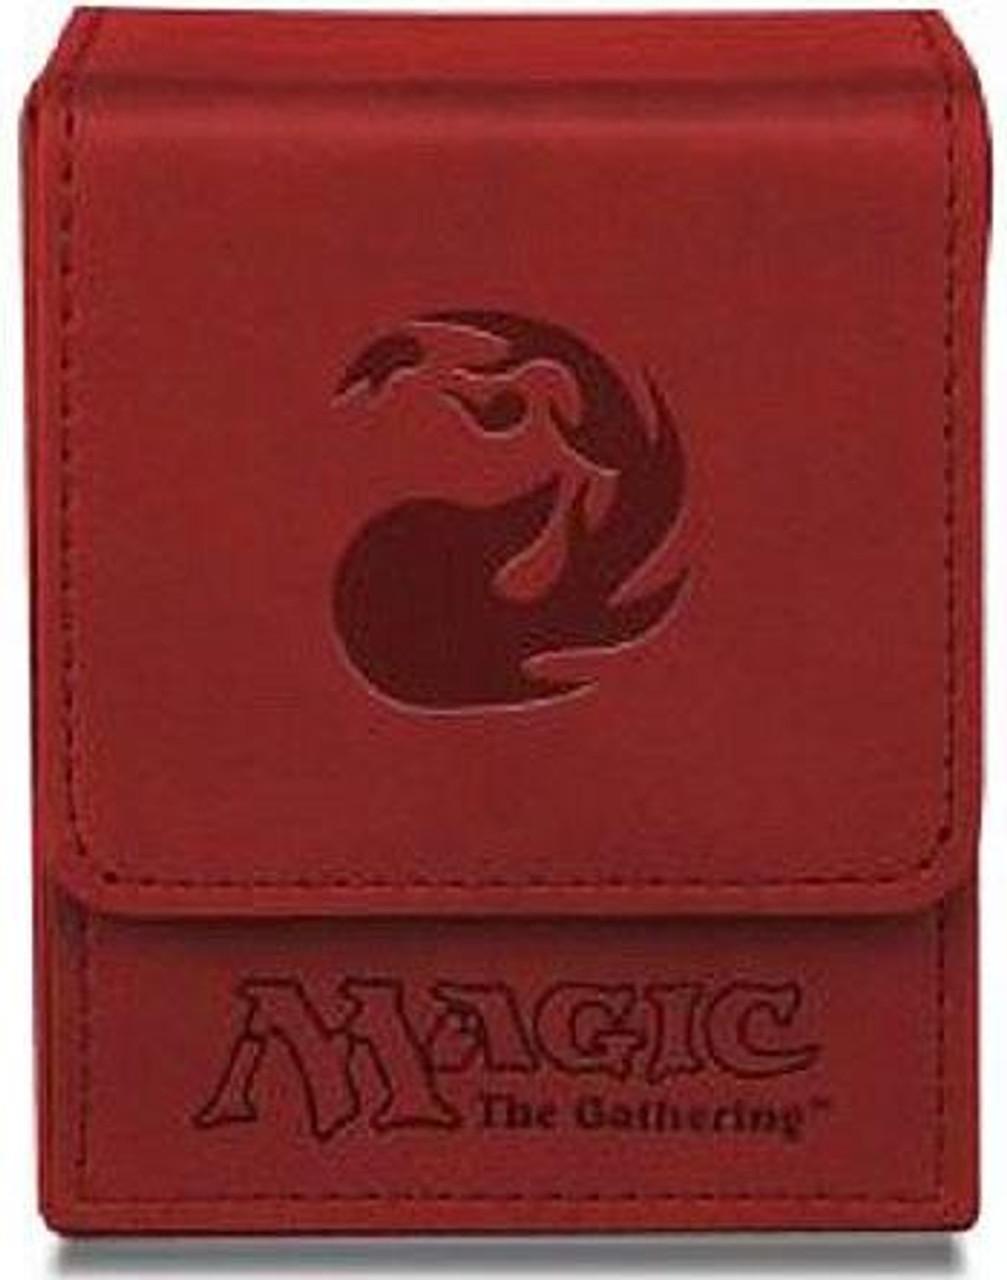 Ultra Pro MtG Premium Flip Red Mana Symbol Deck Box